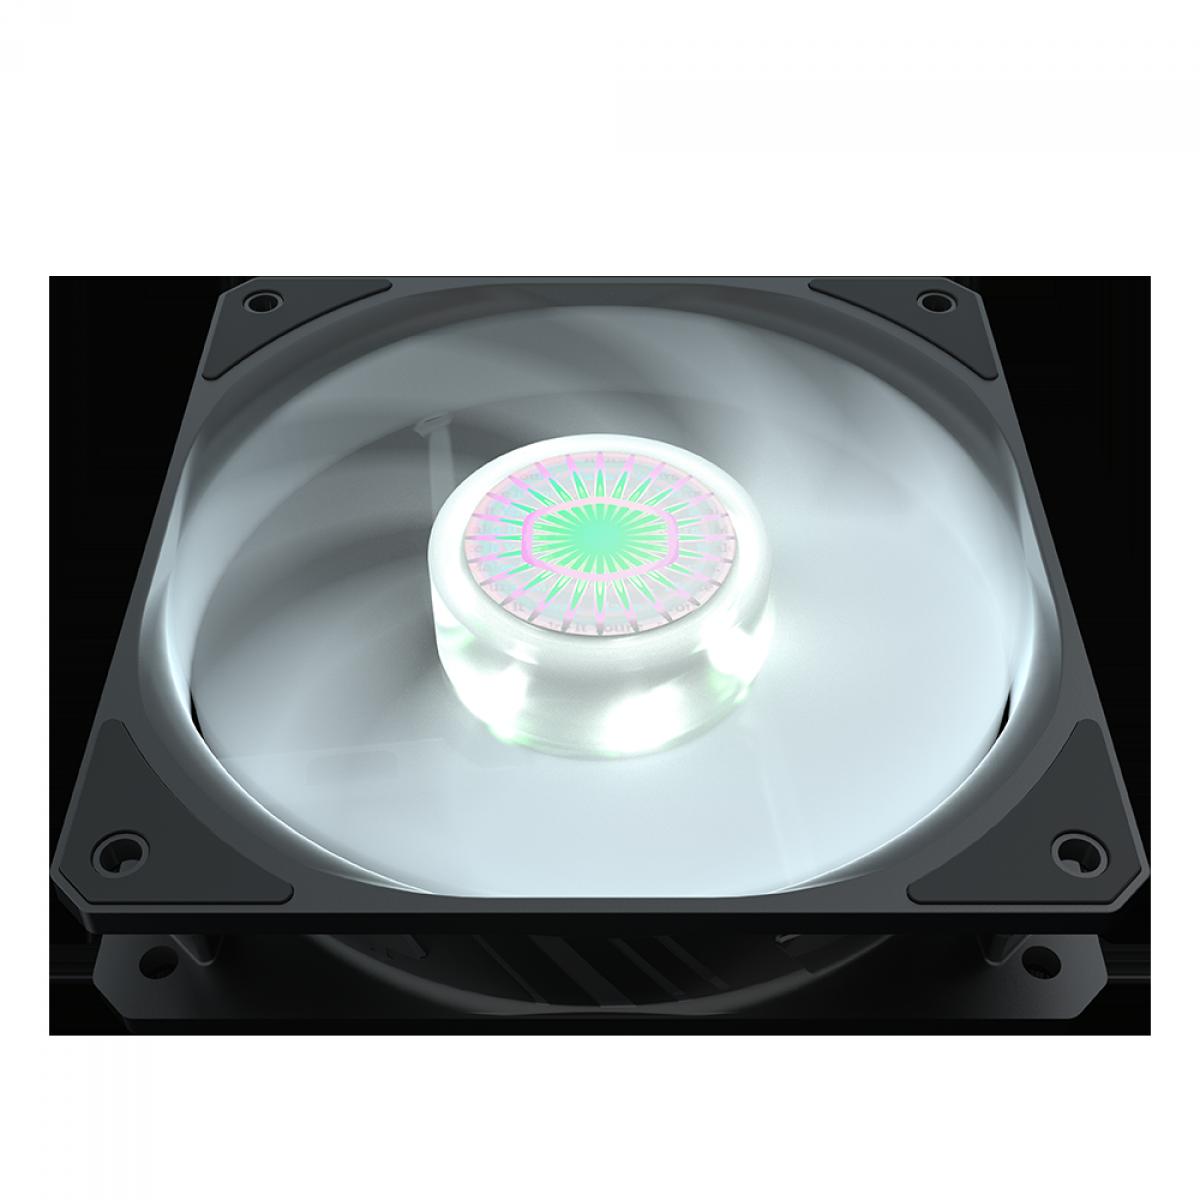 Cooler para Gabinete, Cooler Master, SickleFlow MasterFan MF120 Halo, White, 120mm, 1800RPM, MFX-B2DN-18NPW-R1